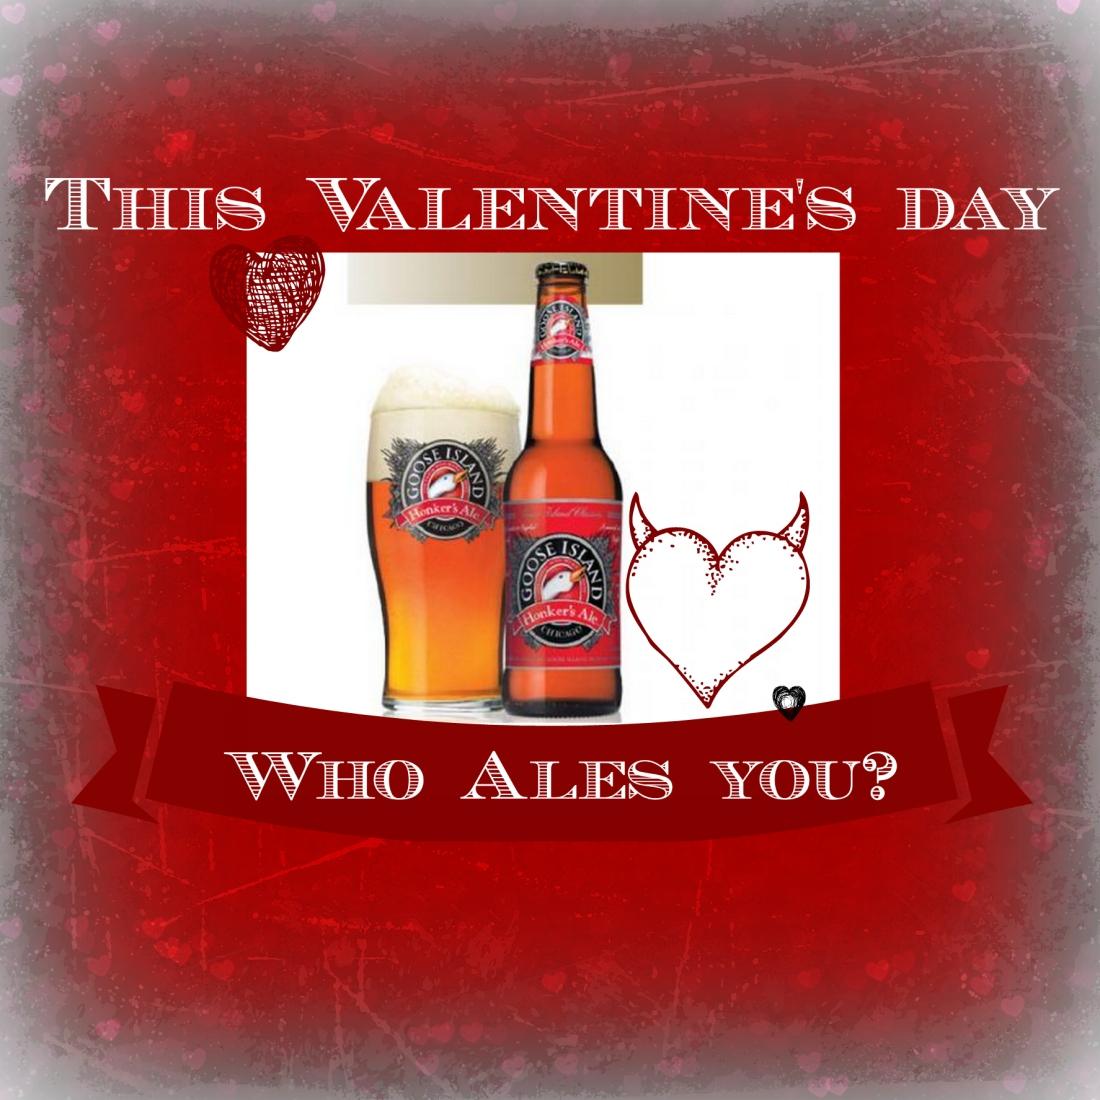 Goose Island VD Ale